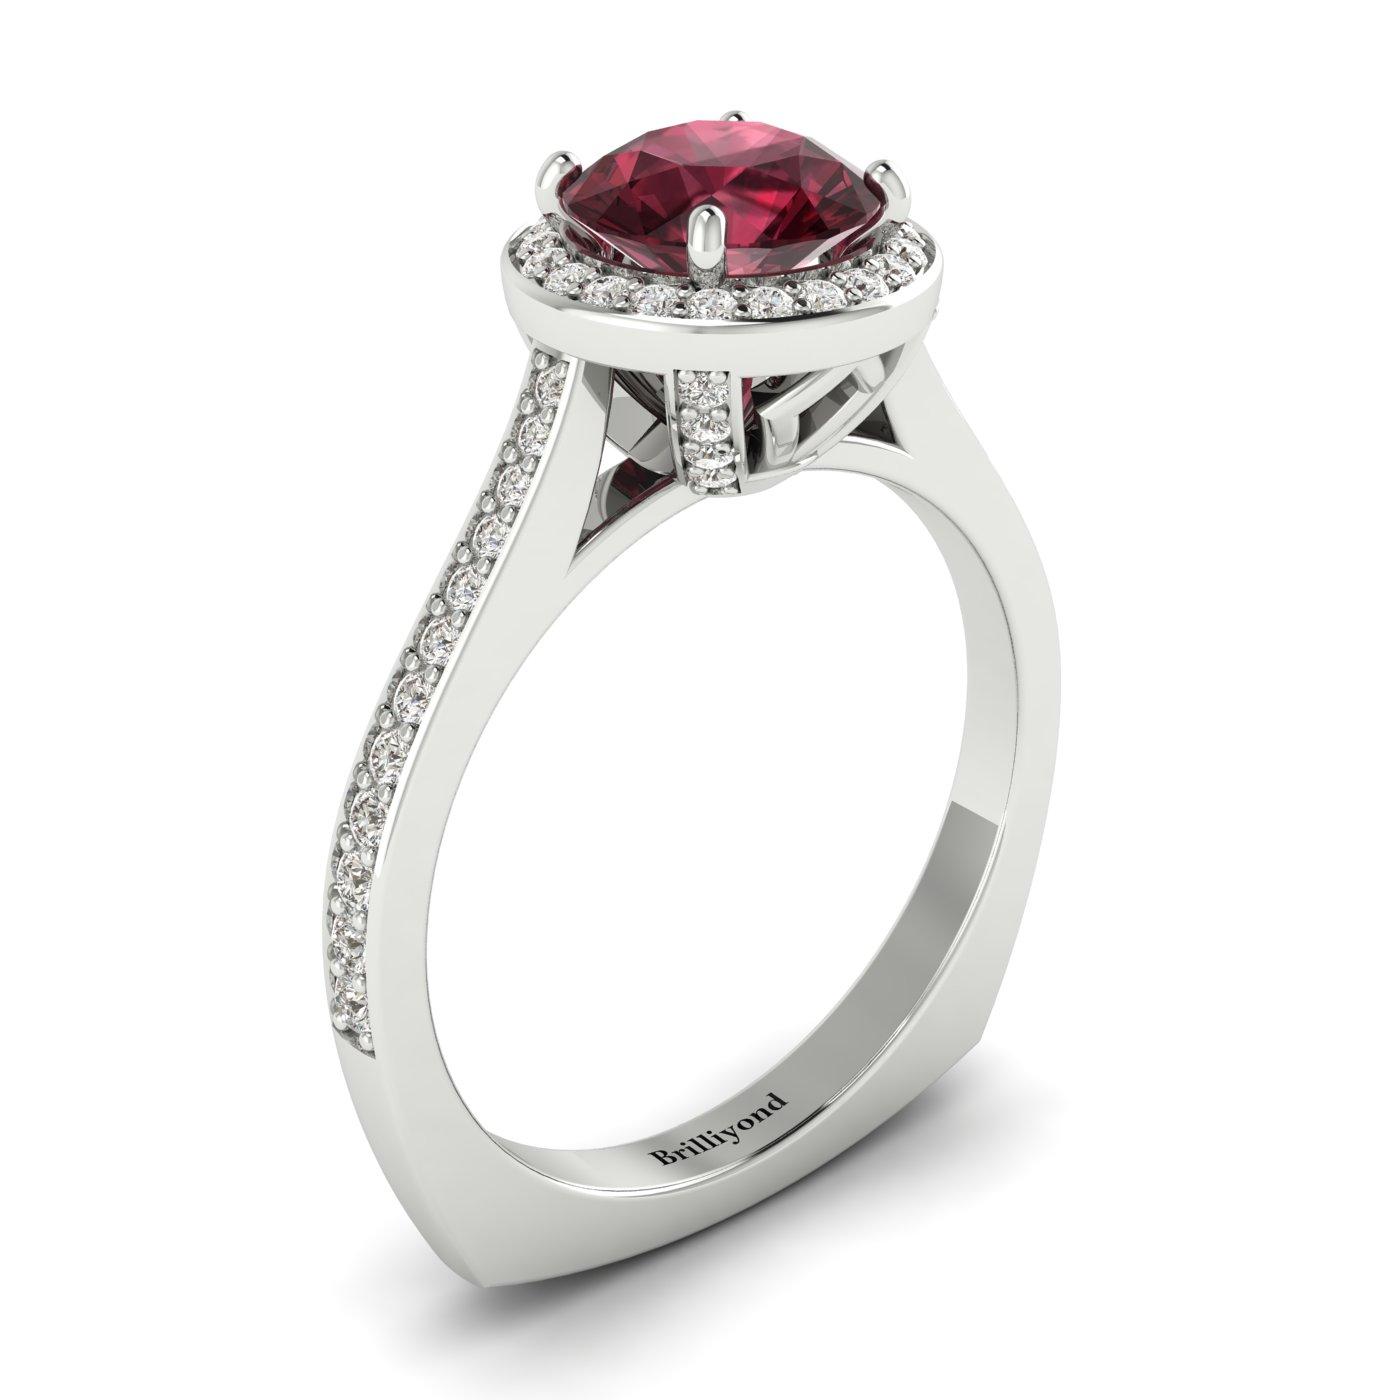 Rhodolite Garnet White Gold Halo Engagement Ring Edelweiss_image2